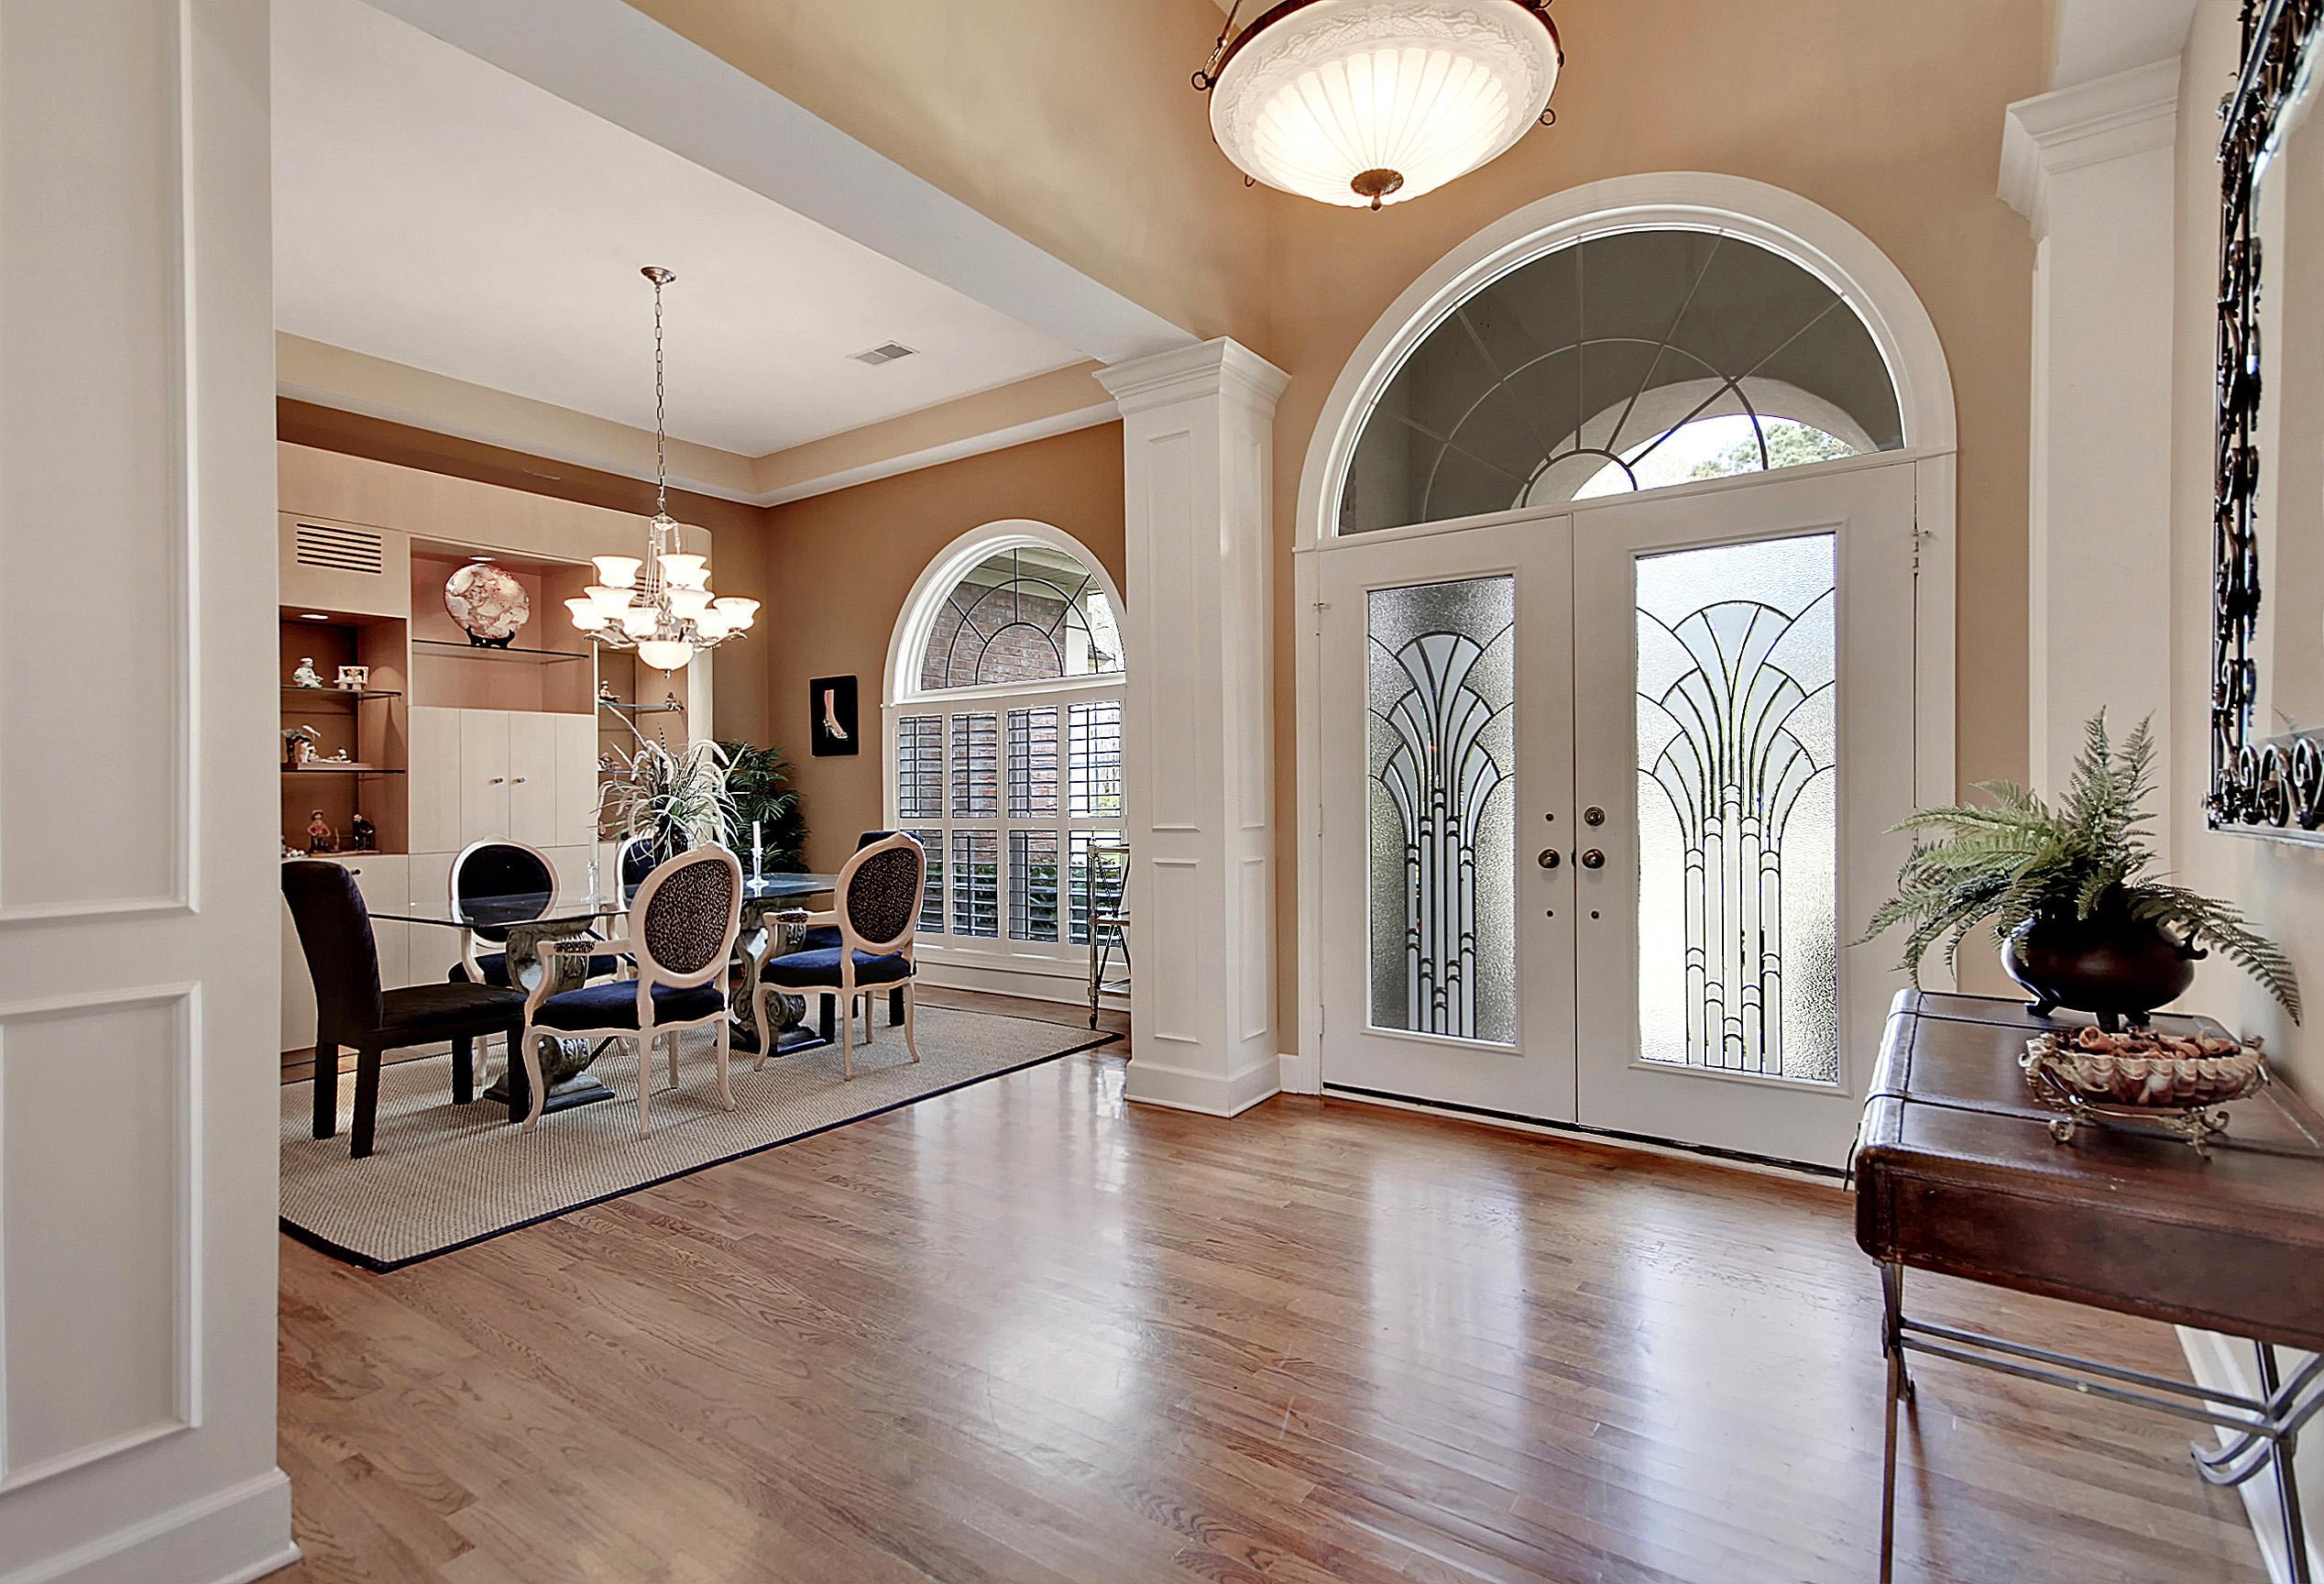 Dunes West Homes For Sale - 4002 Colonel Vanderhorst, Mount Pleasant, SC - 51